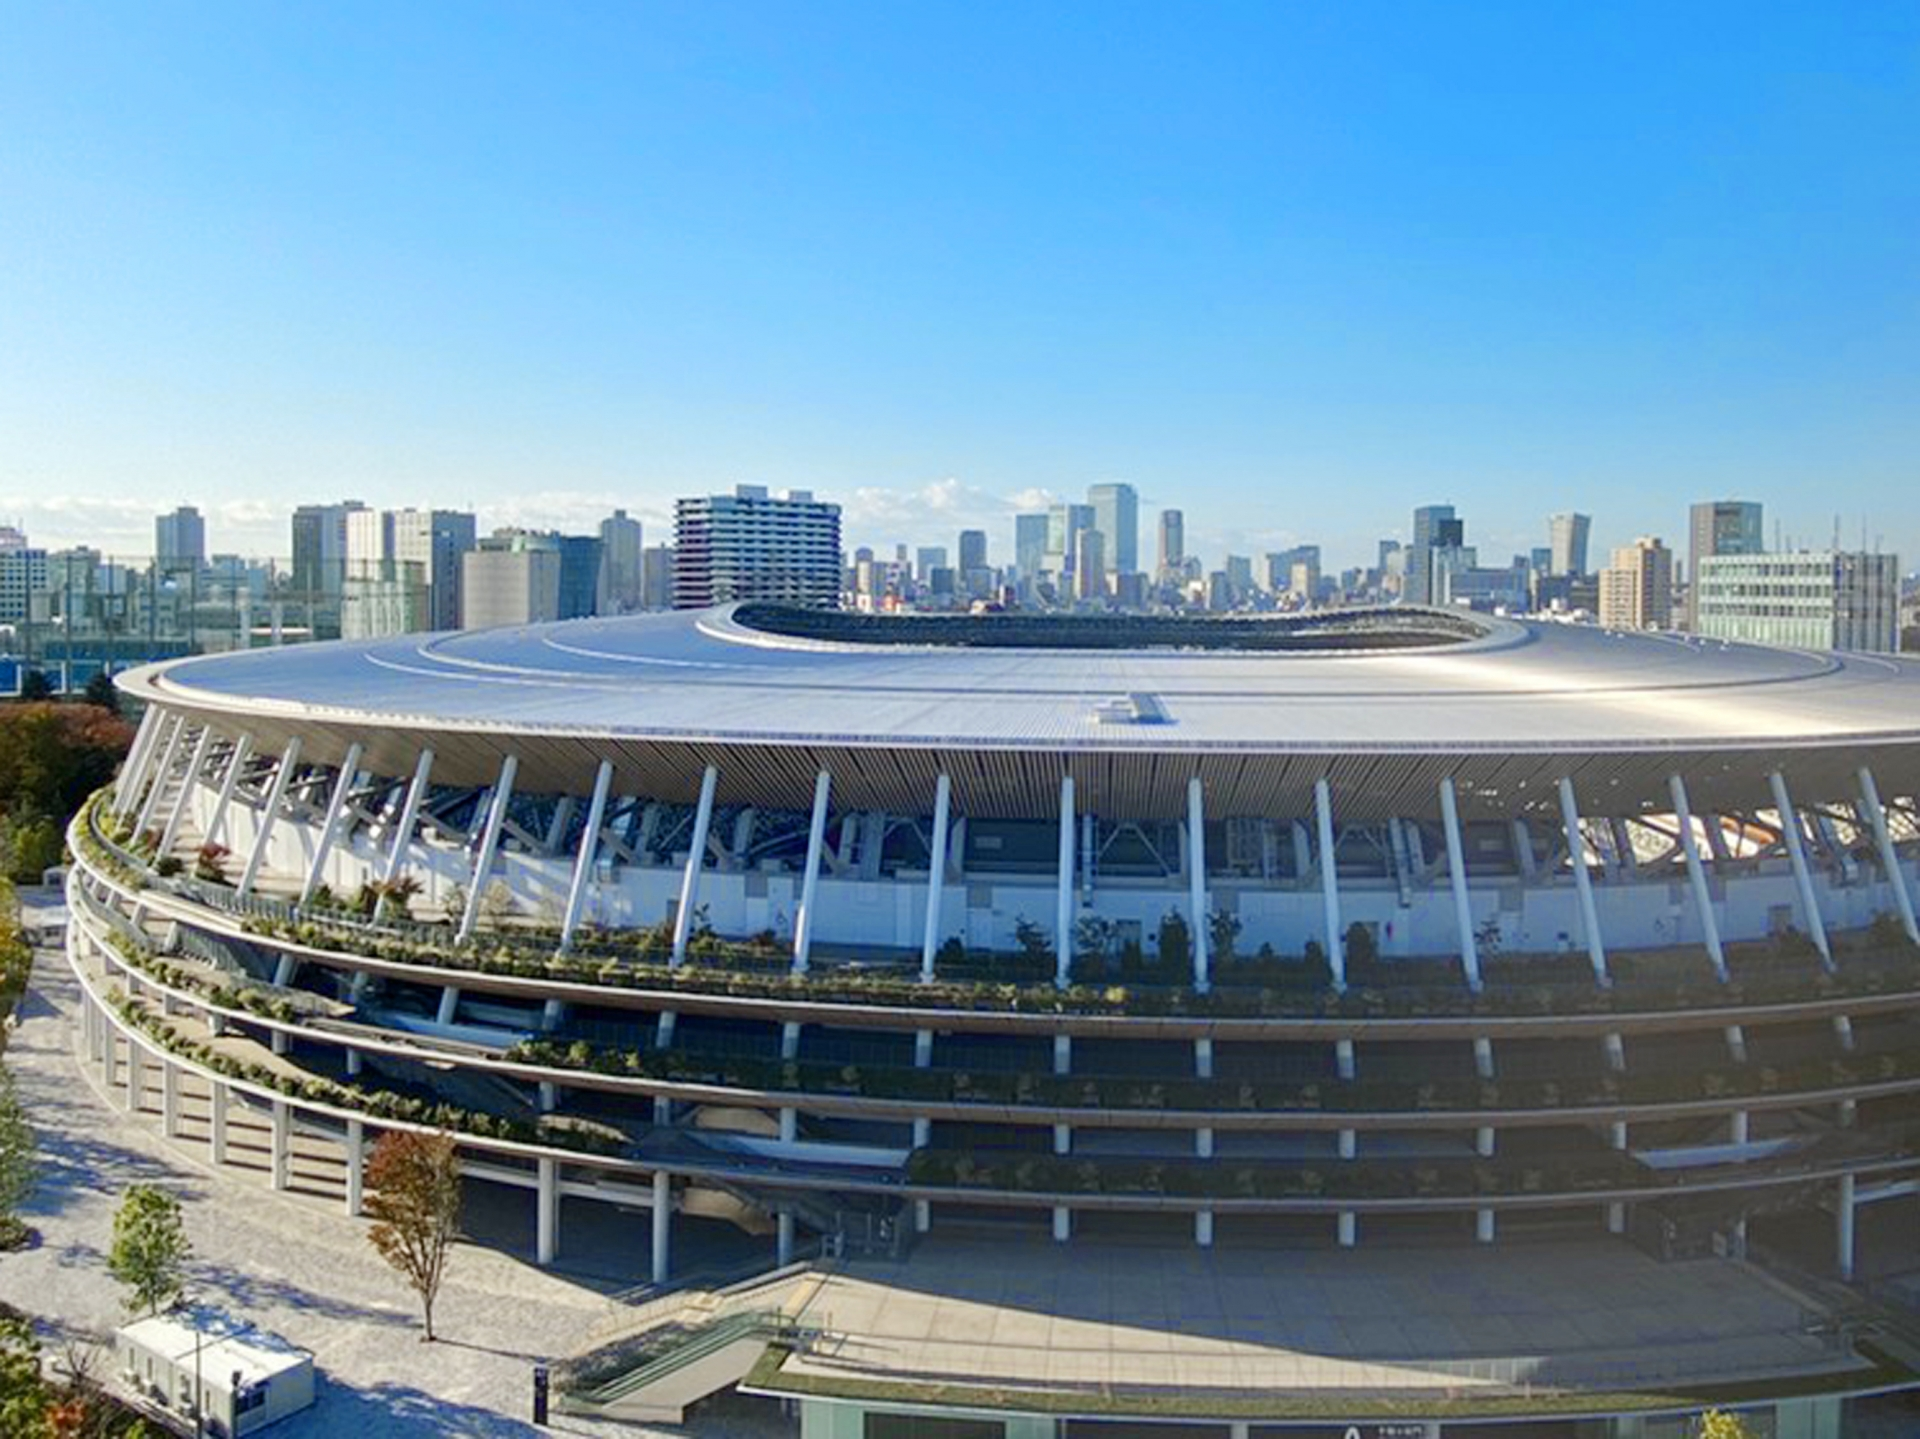 IOCがコロナ渦中でも東京五輪を「強行開催」したい3つの理由